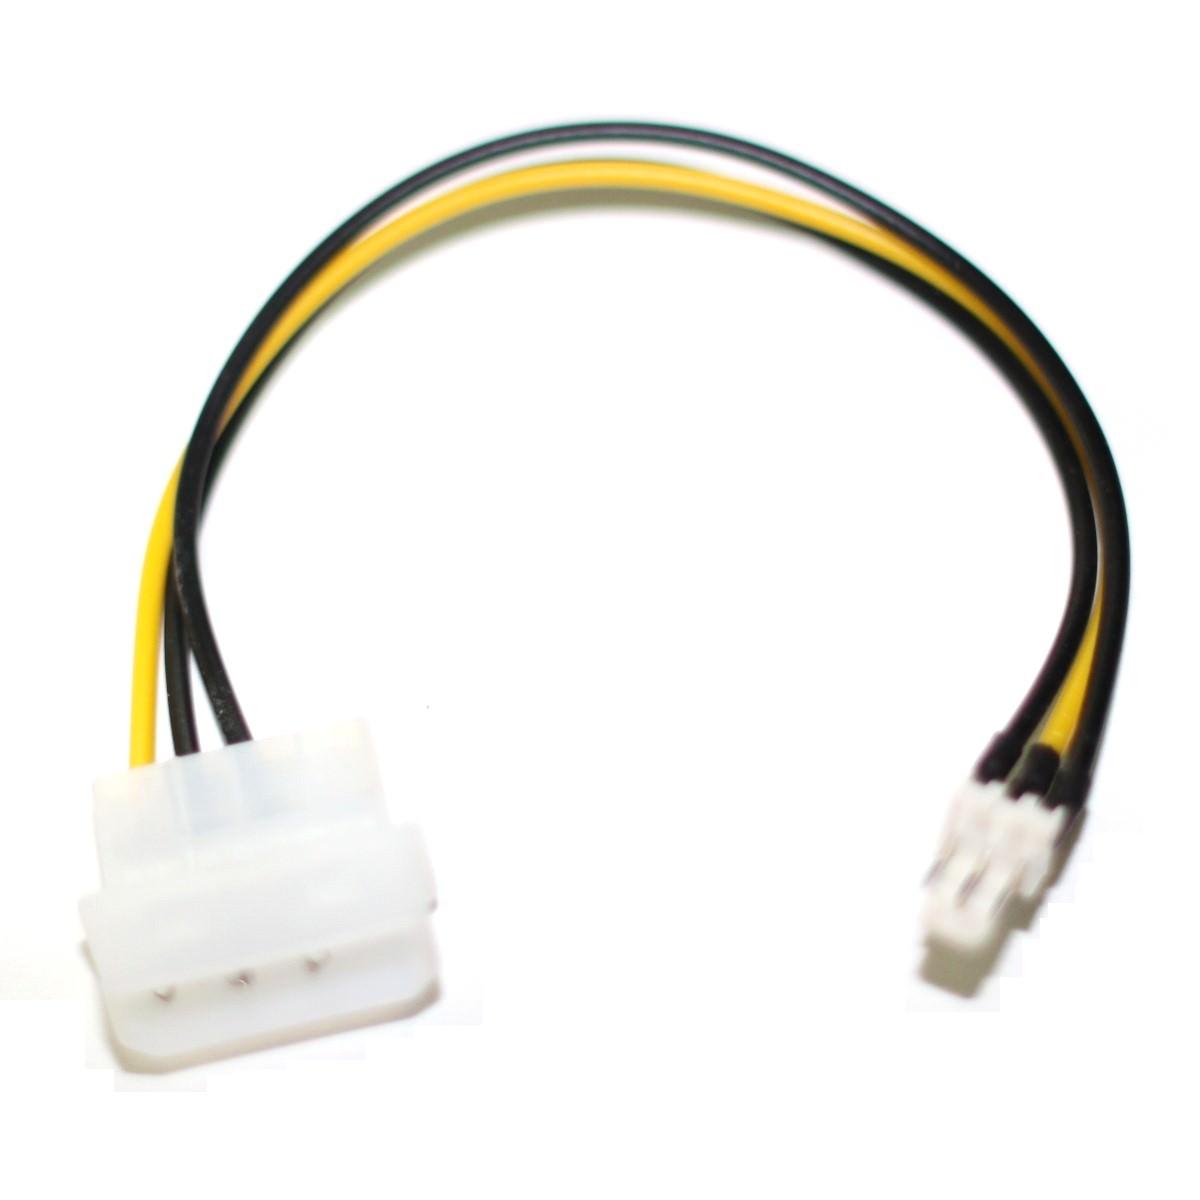 3 pin molex wiring diagram trailer light nz 4 connector male to standard fan